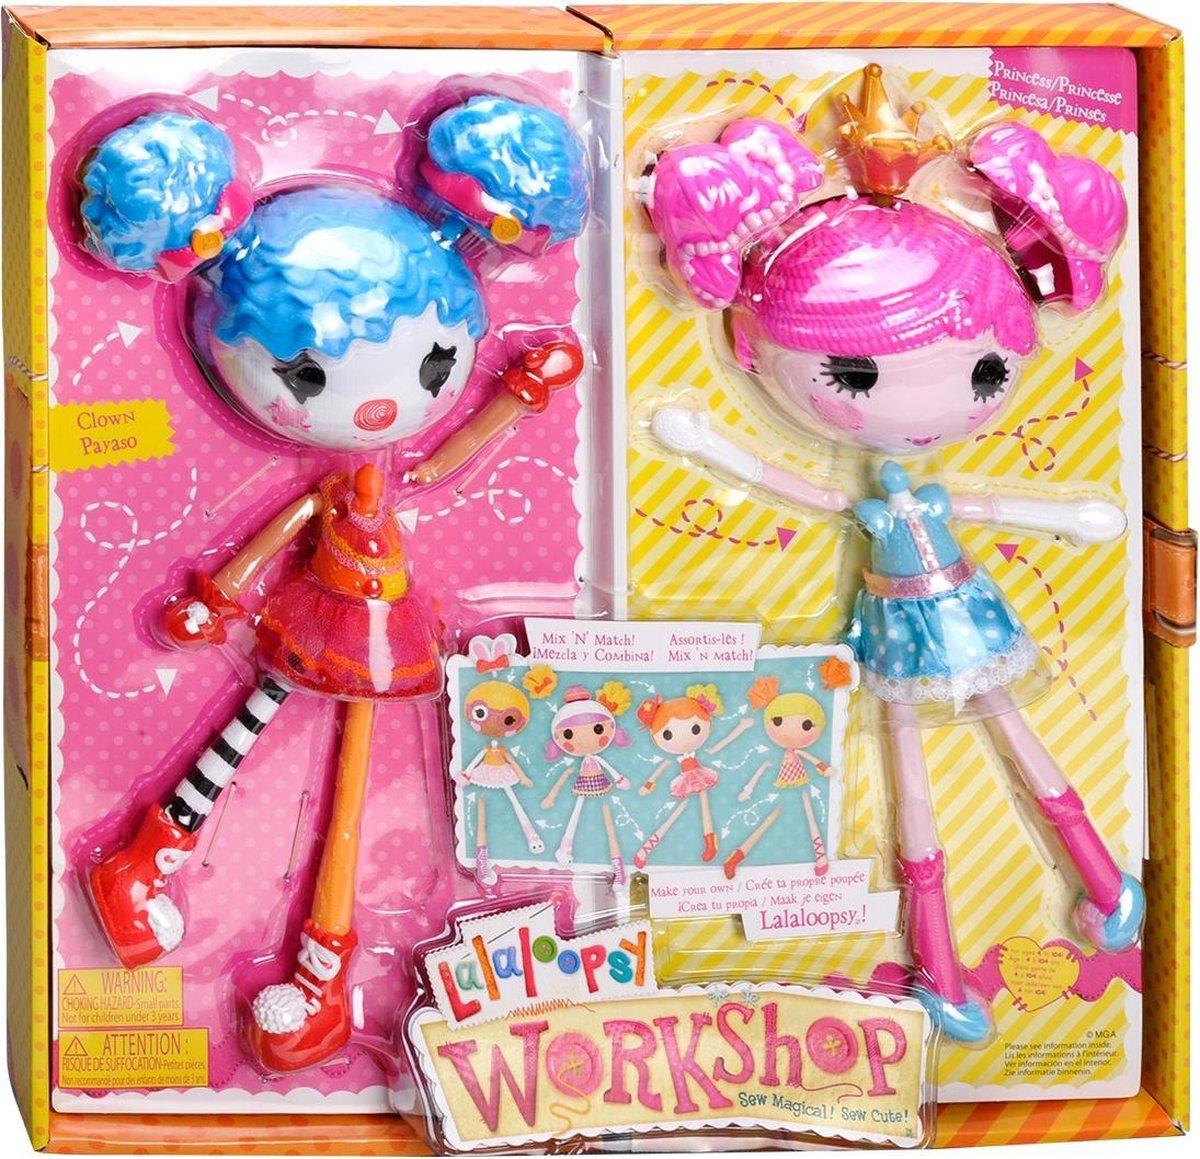 Lalaloopsy Workshop Dubbelset Princess&clown - Pop